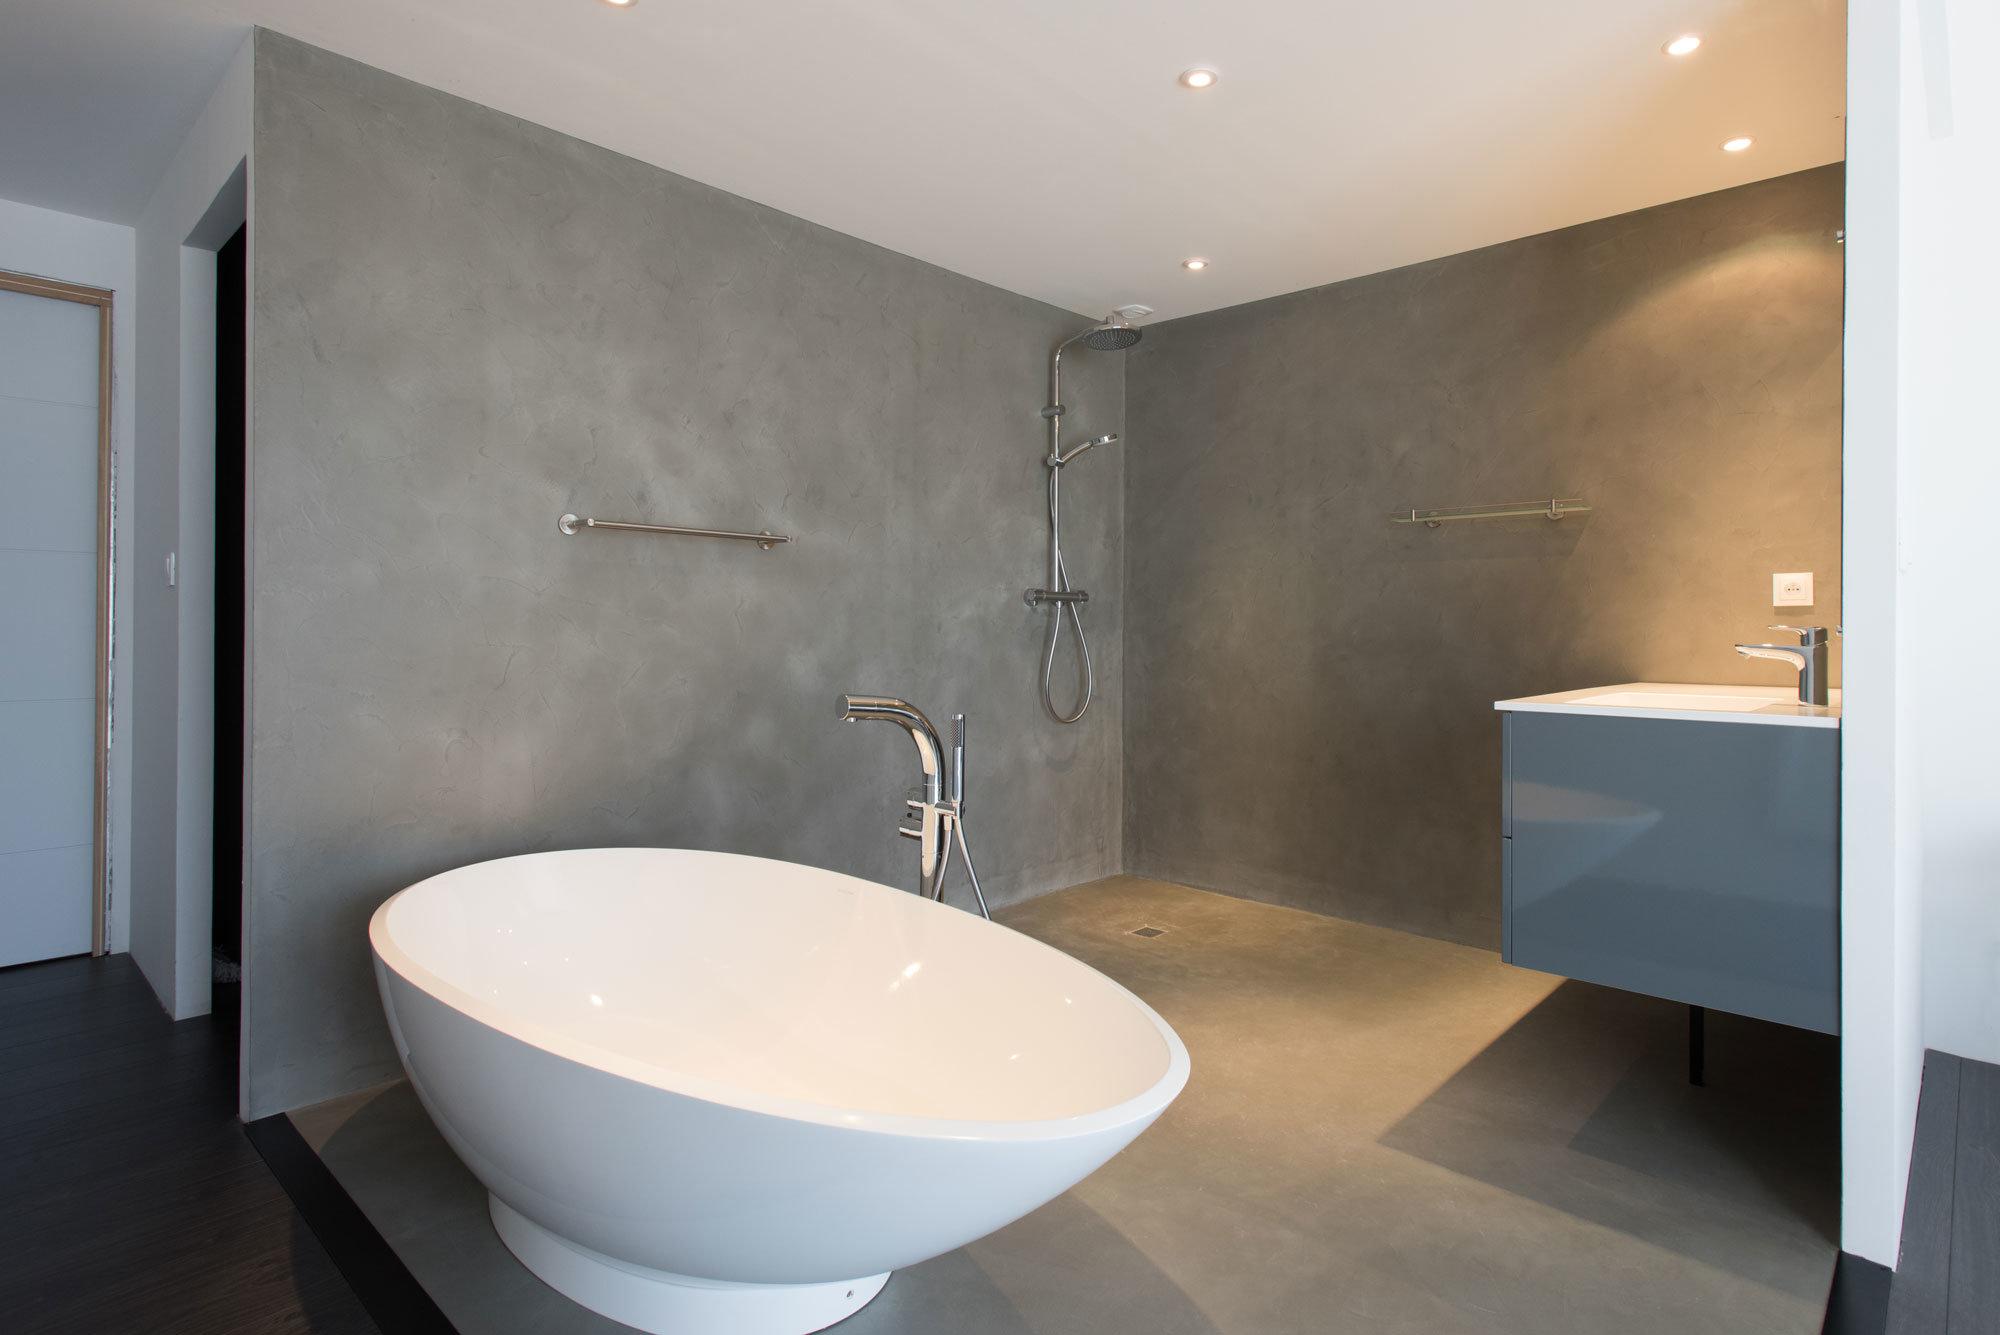 decoration de salles de bains en micro